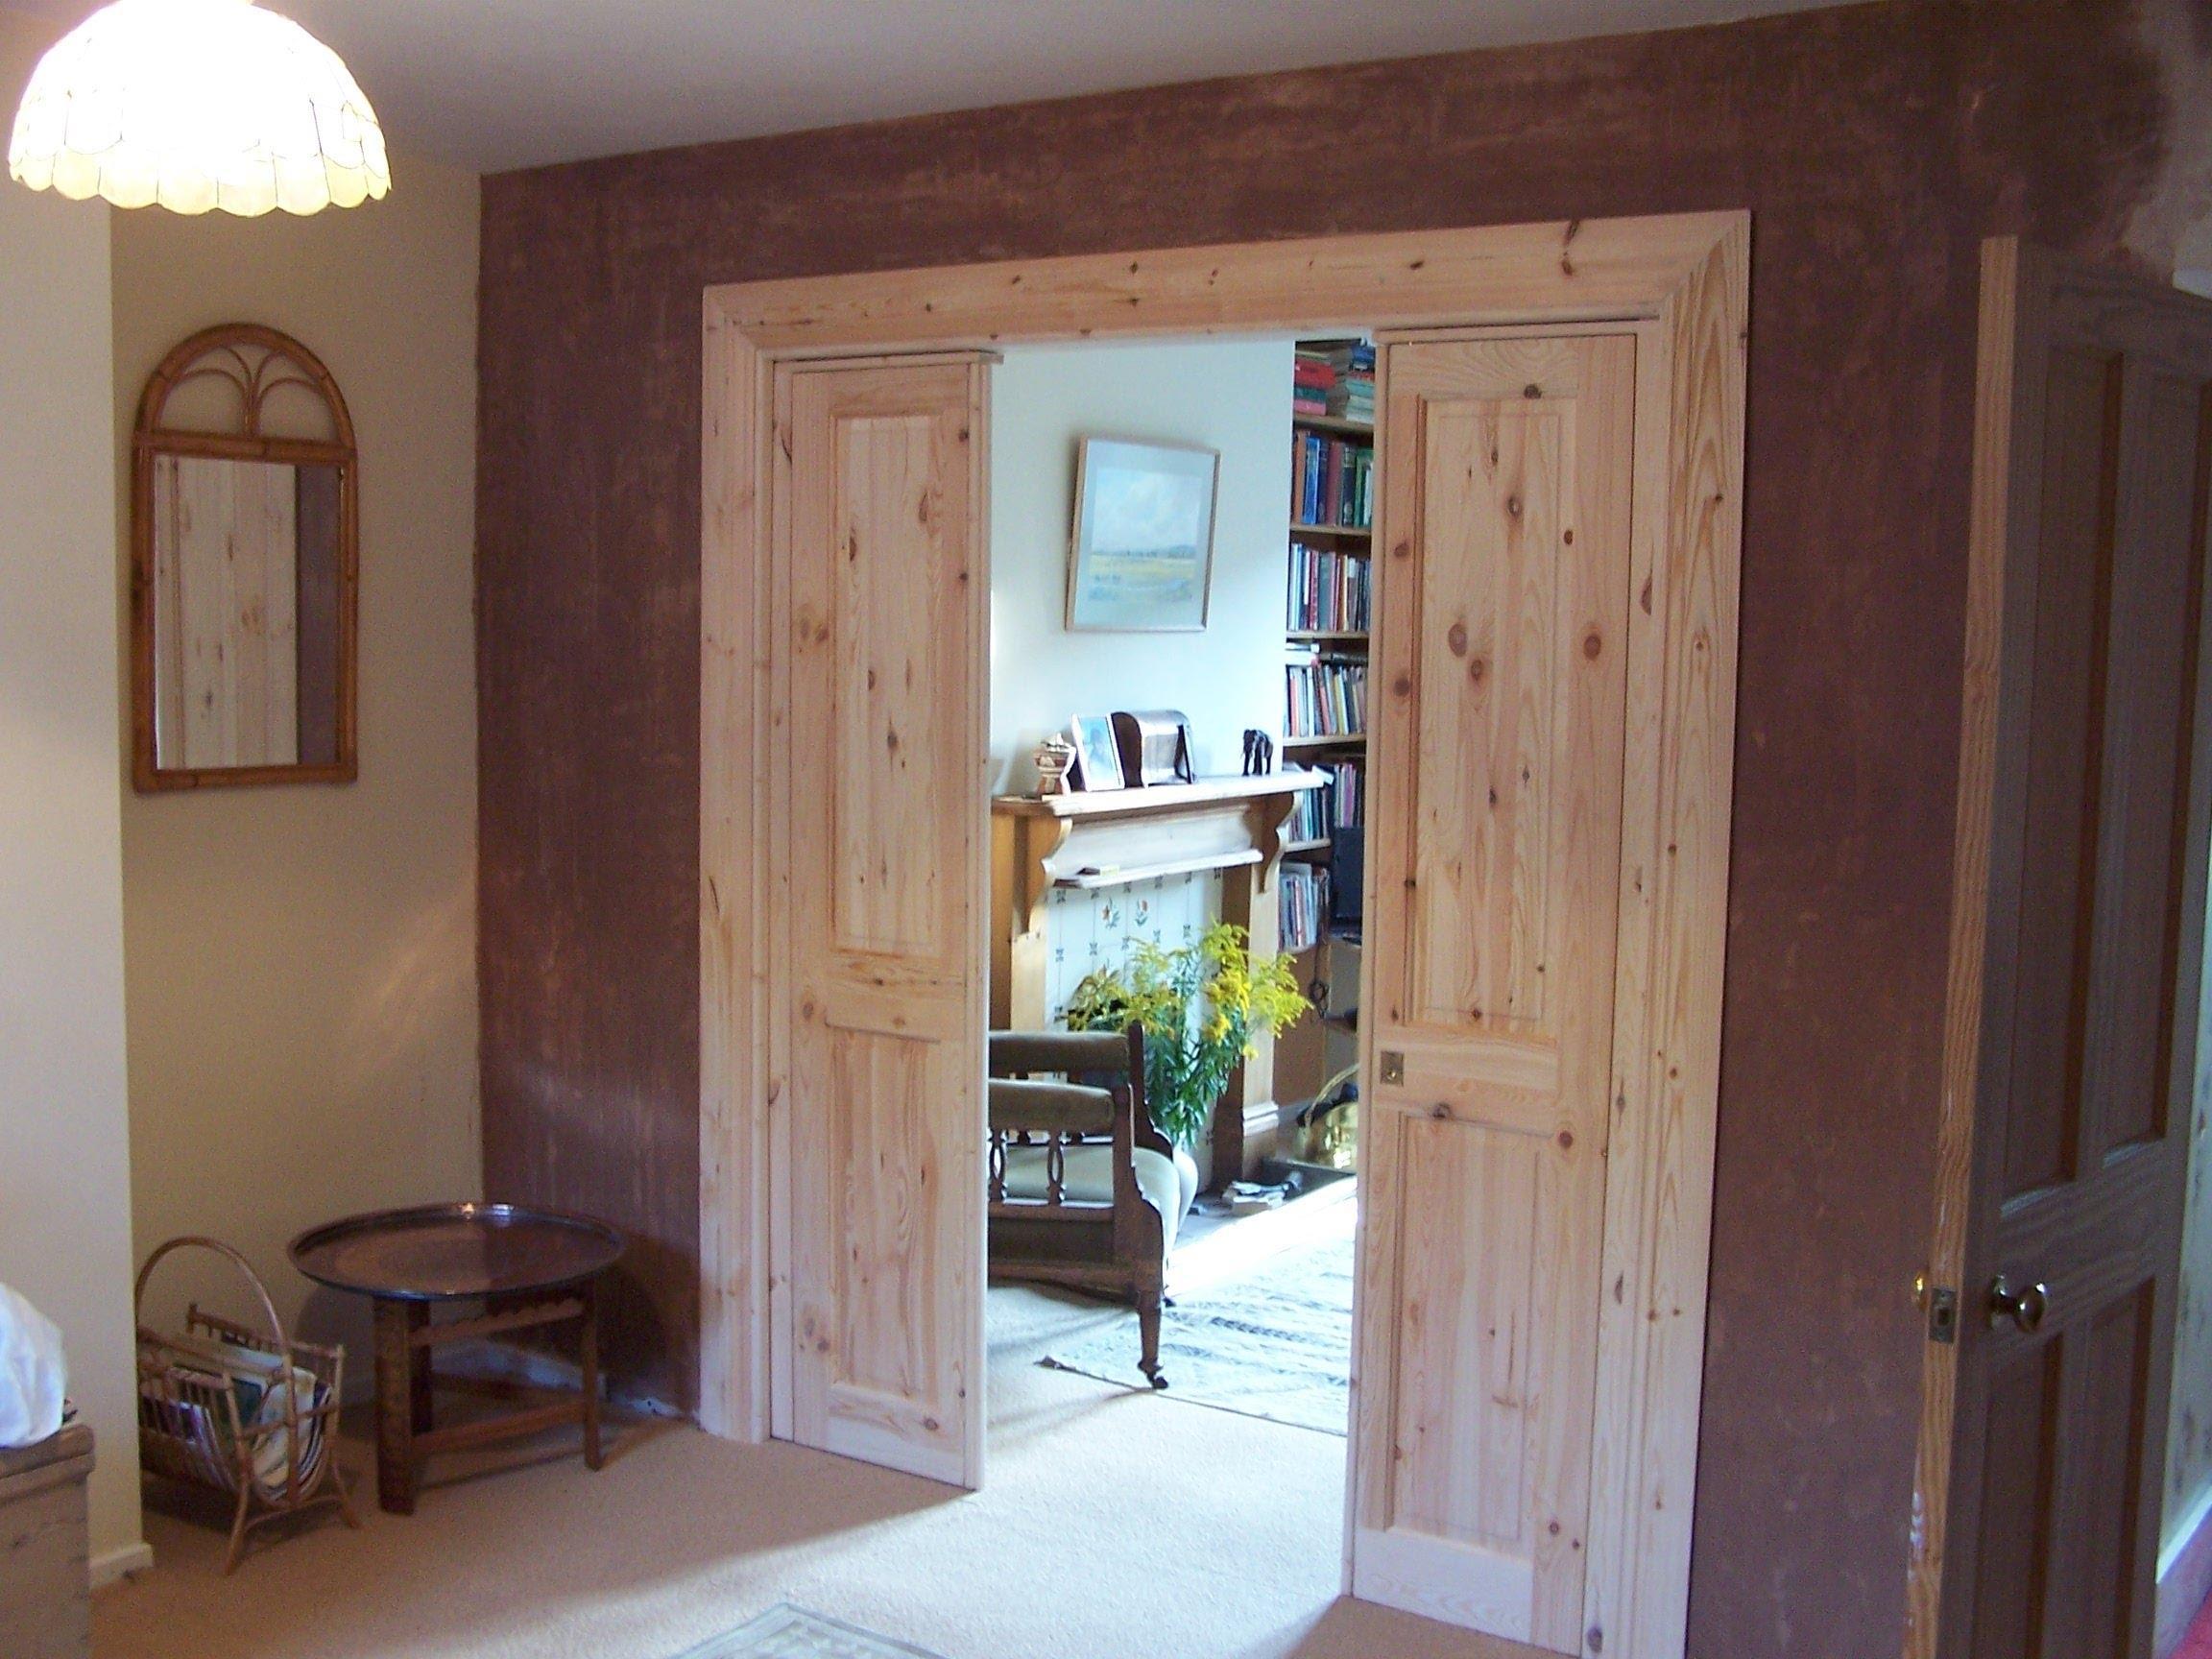 Closet Door That Slides Into Wall